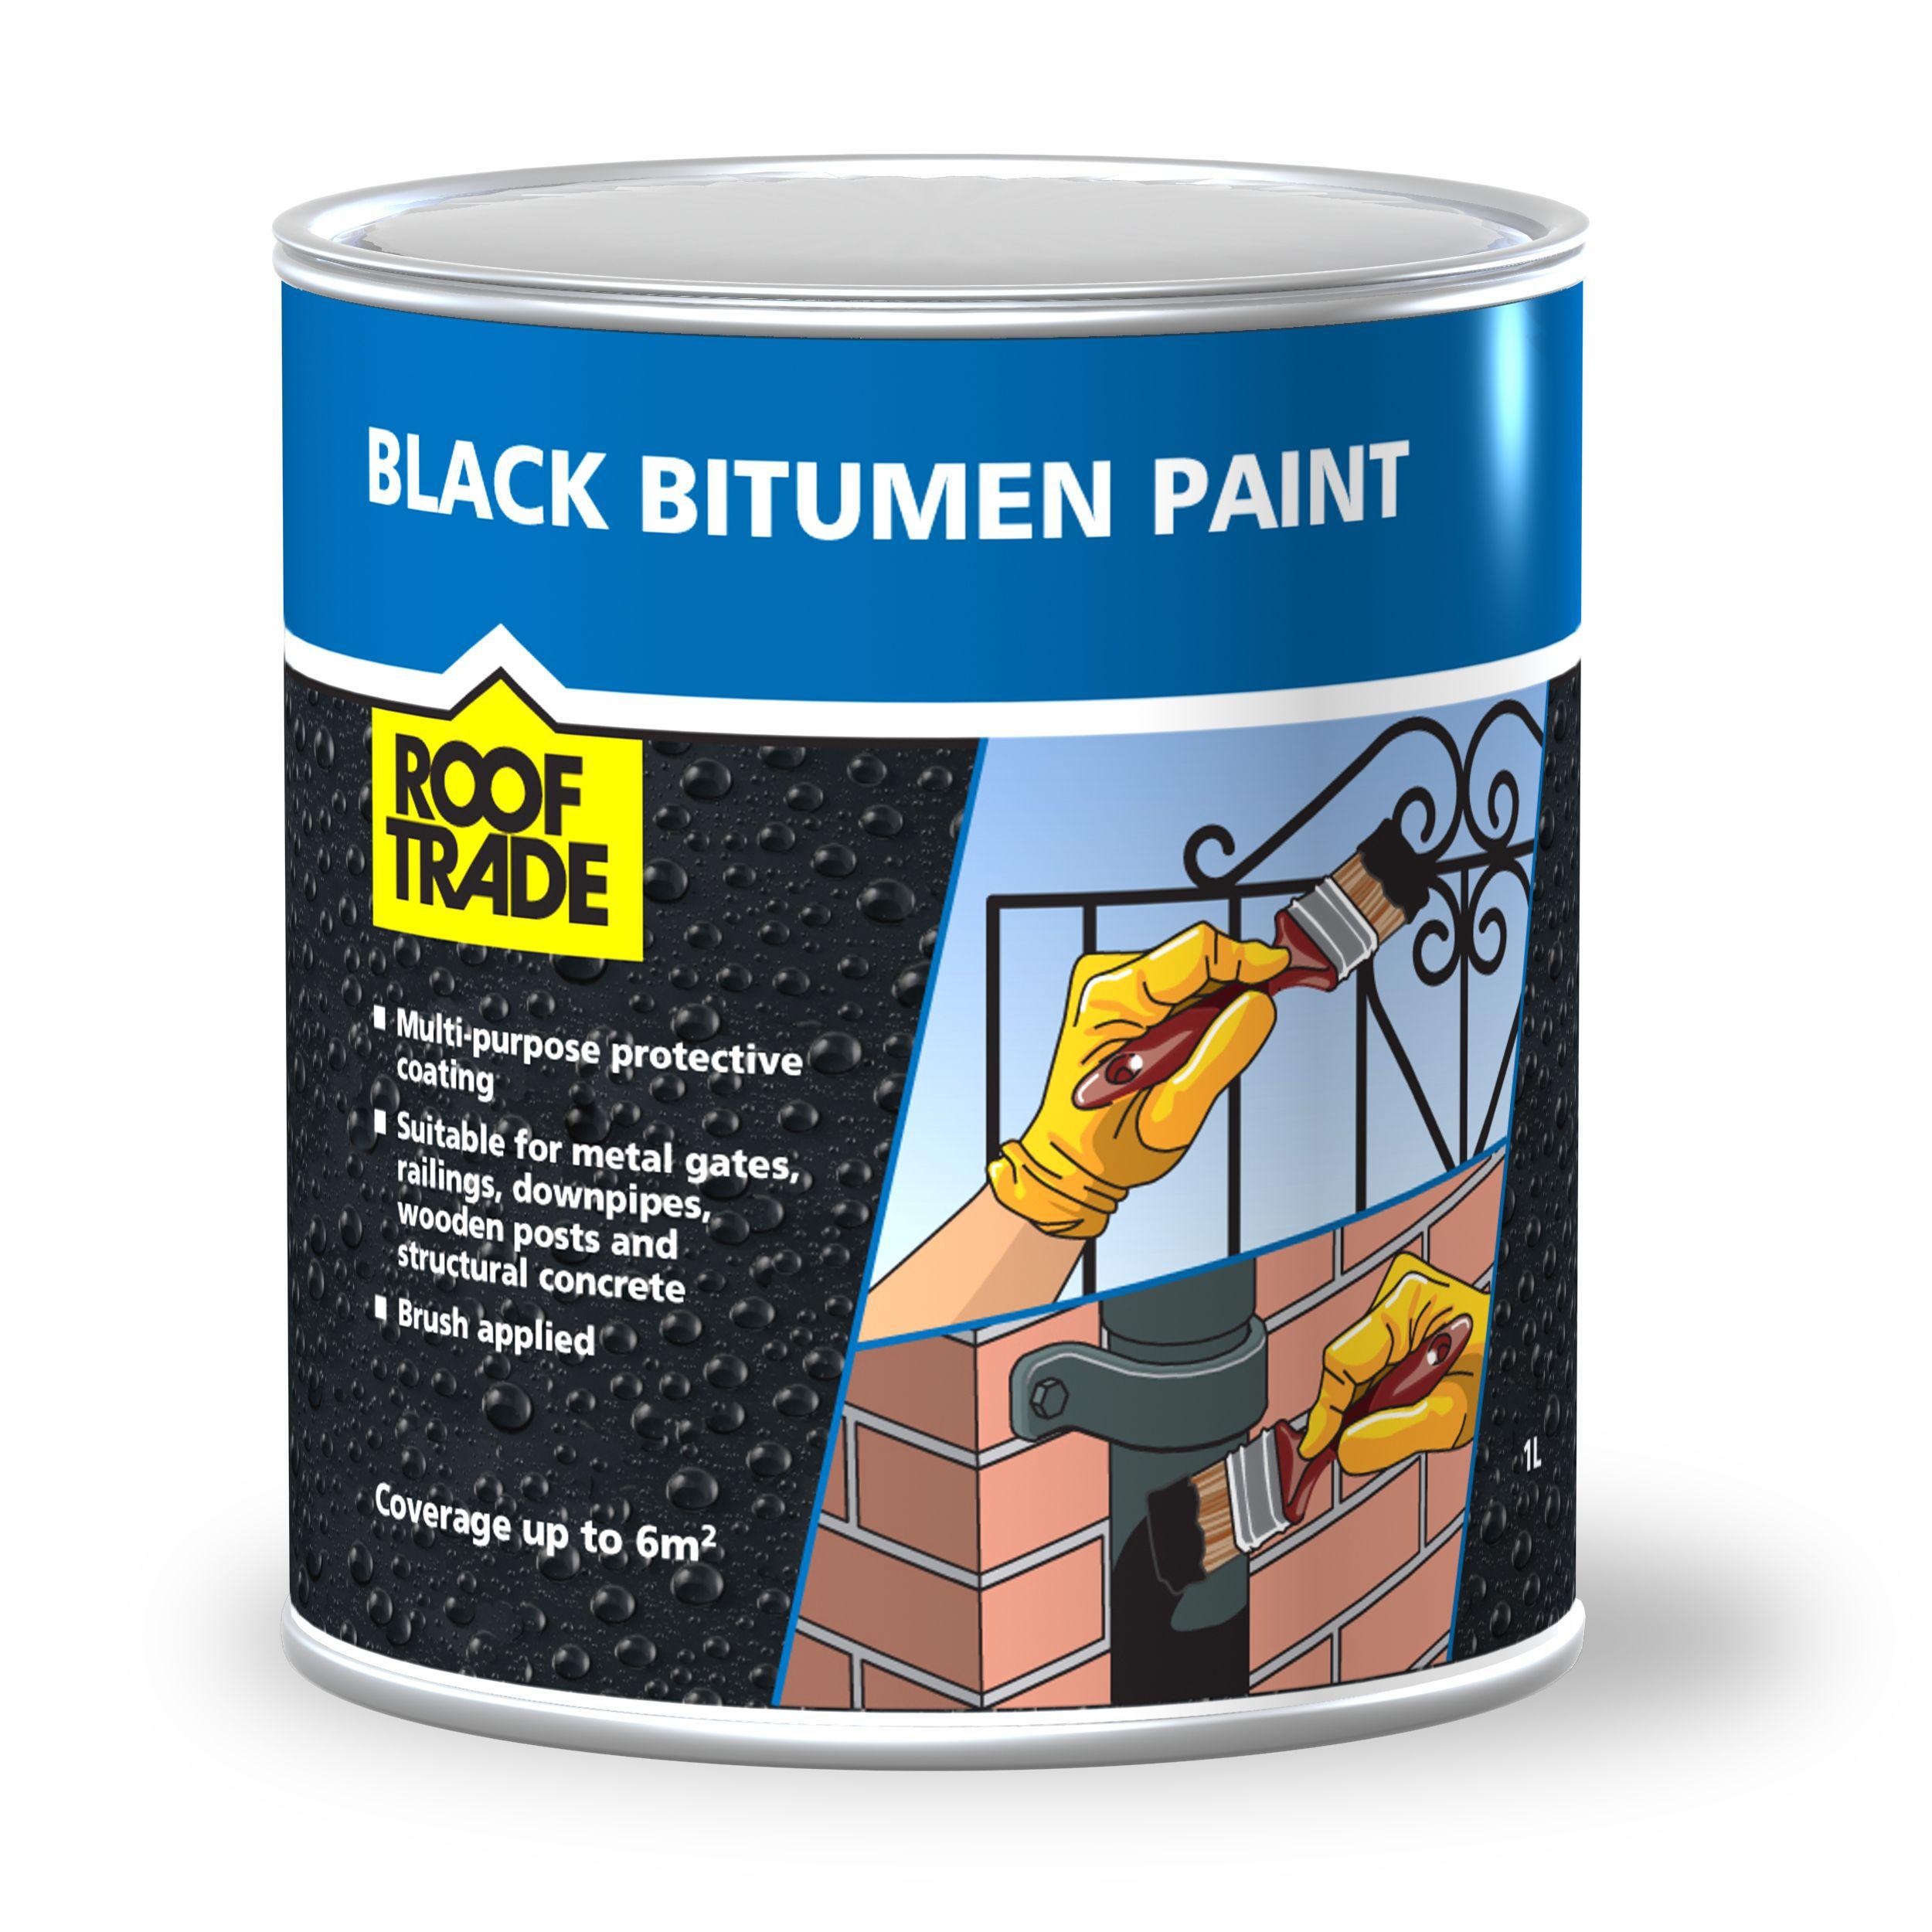 Rooftrade Black Bitumen Paint 1l Departments Diy At B Amp Q